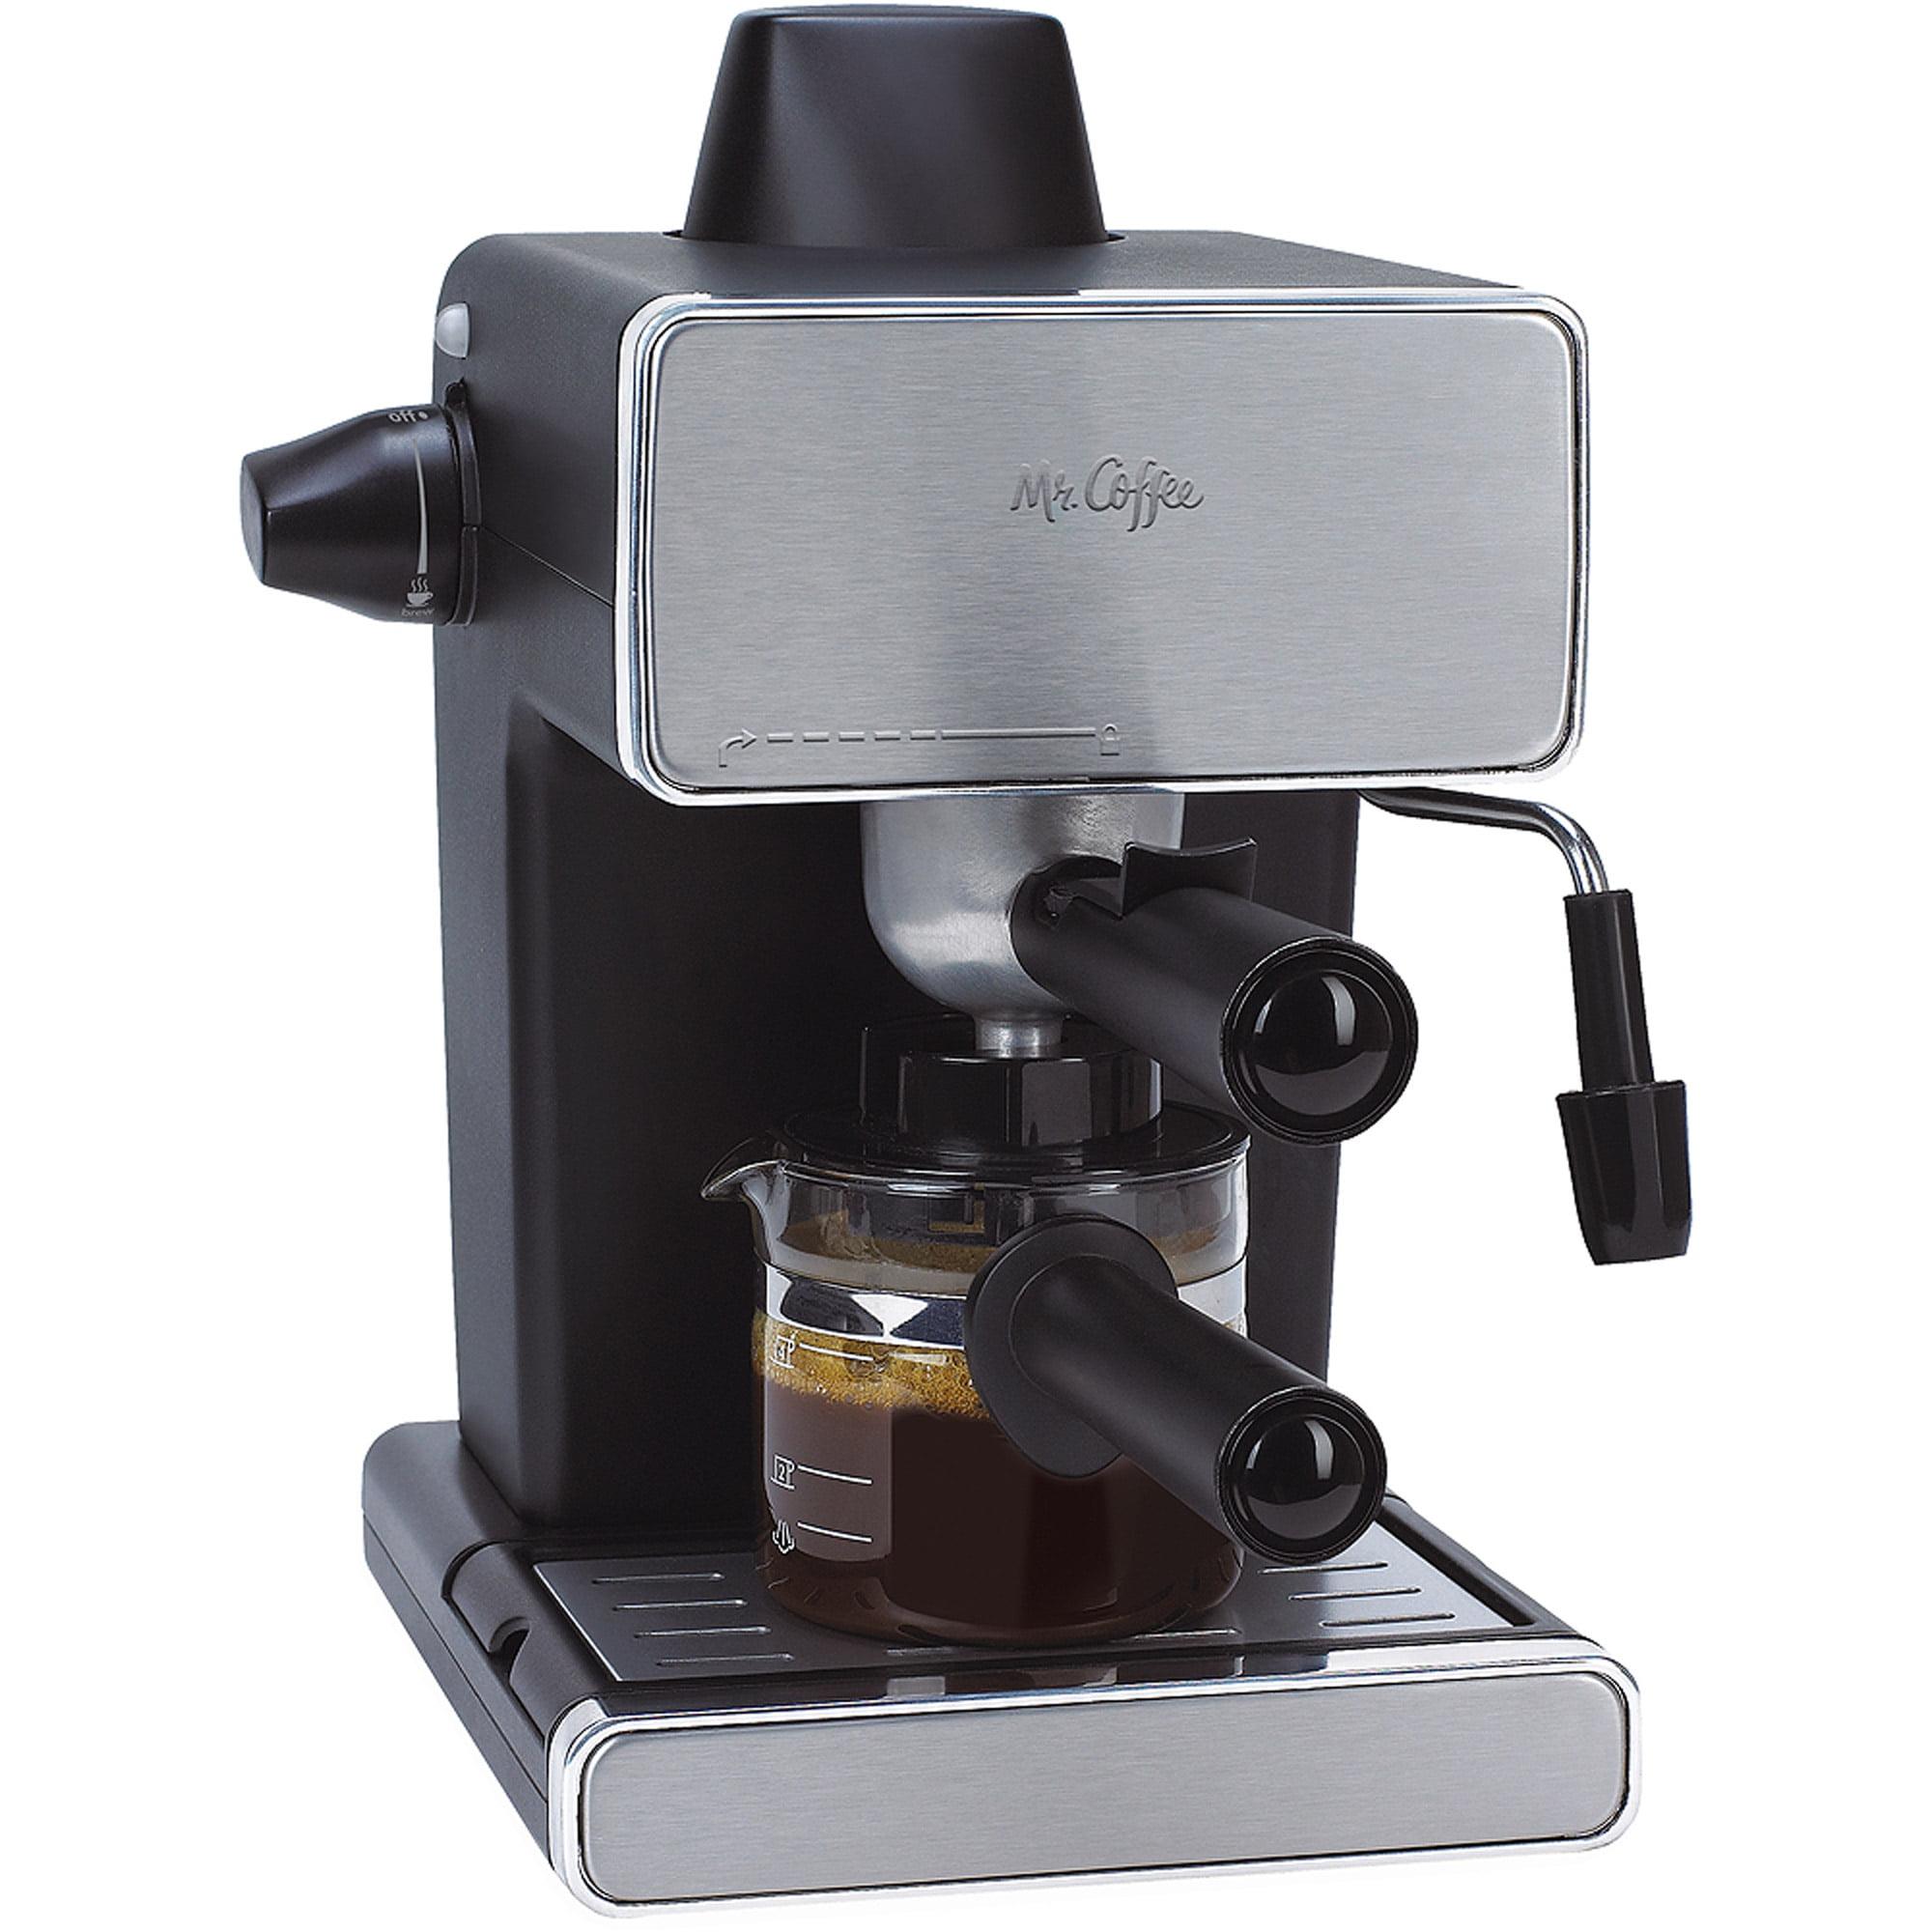 Mr. Coffee Espresso Maker, Stainless Steel and Black, BVMC-ECM260